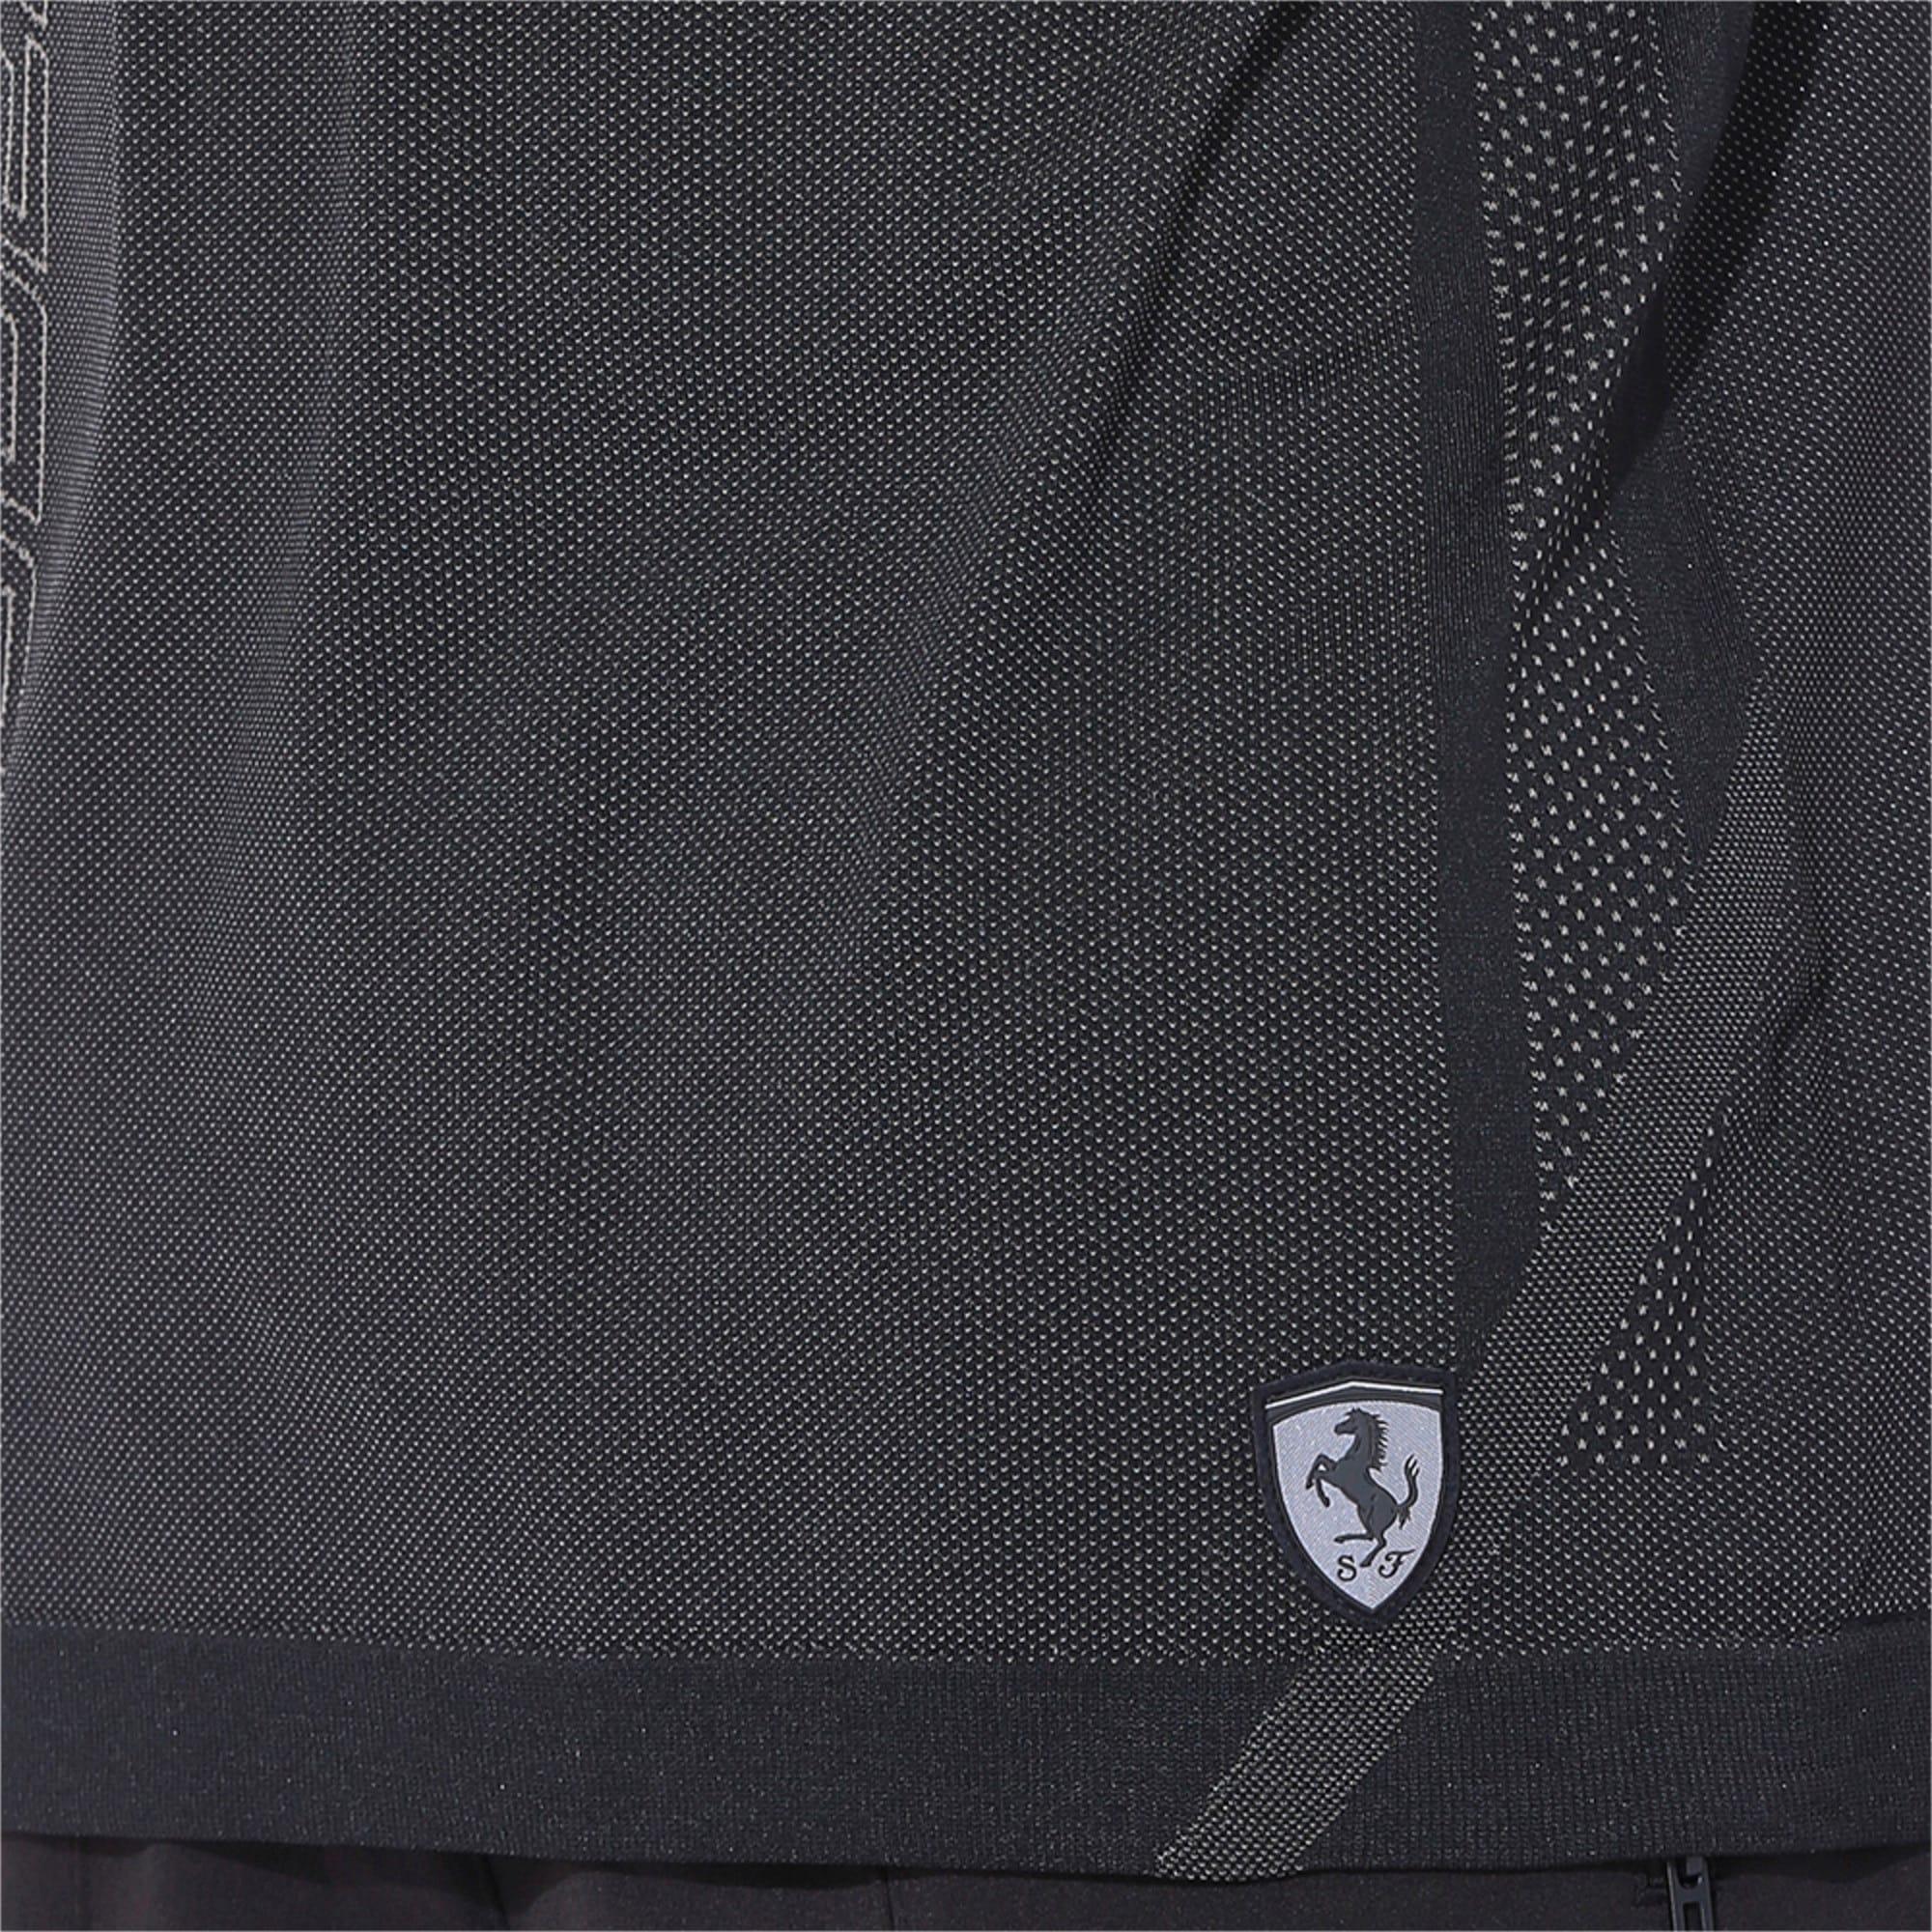 Thumbnail 6 of Ferrari RCT evoKNIT Men's Tee, Puma Black, medium-IND